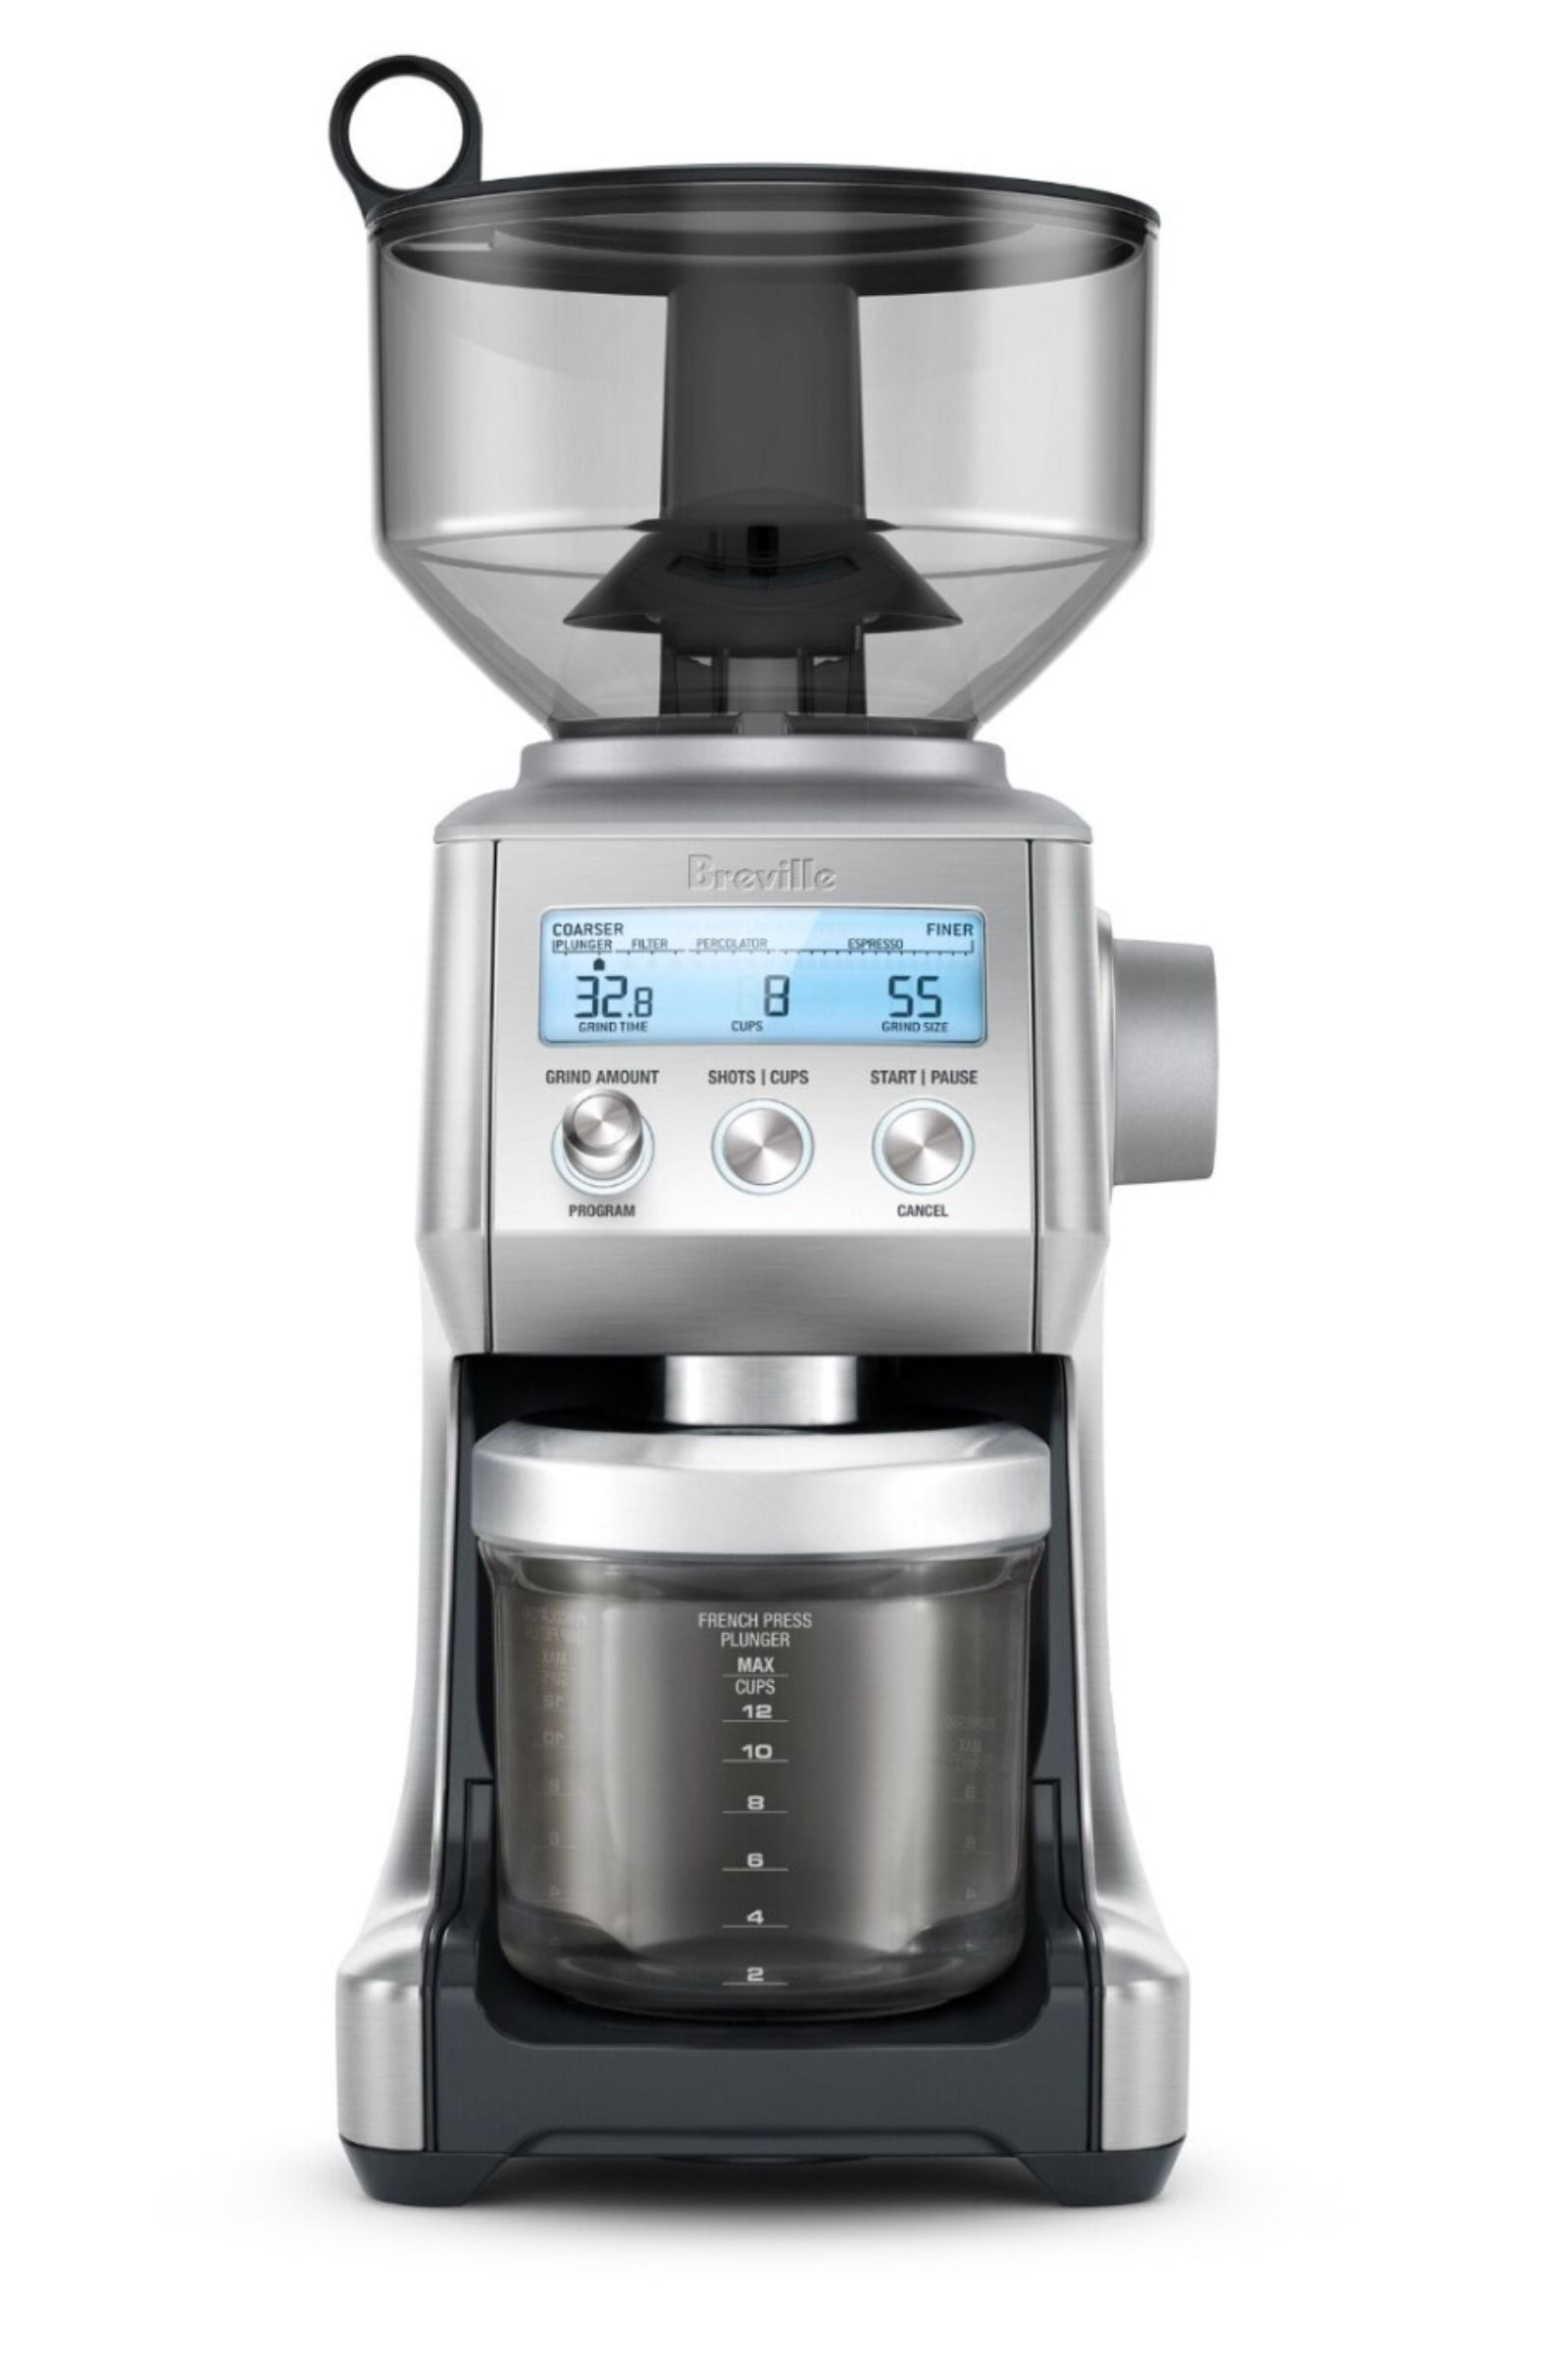 breville smart coffee grinder pro reviews